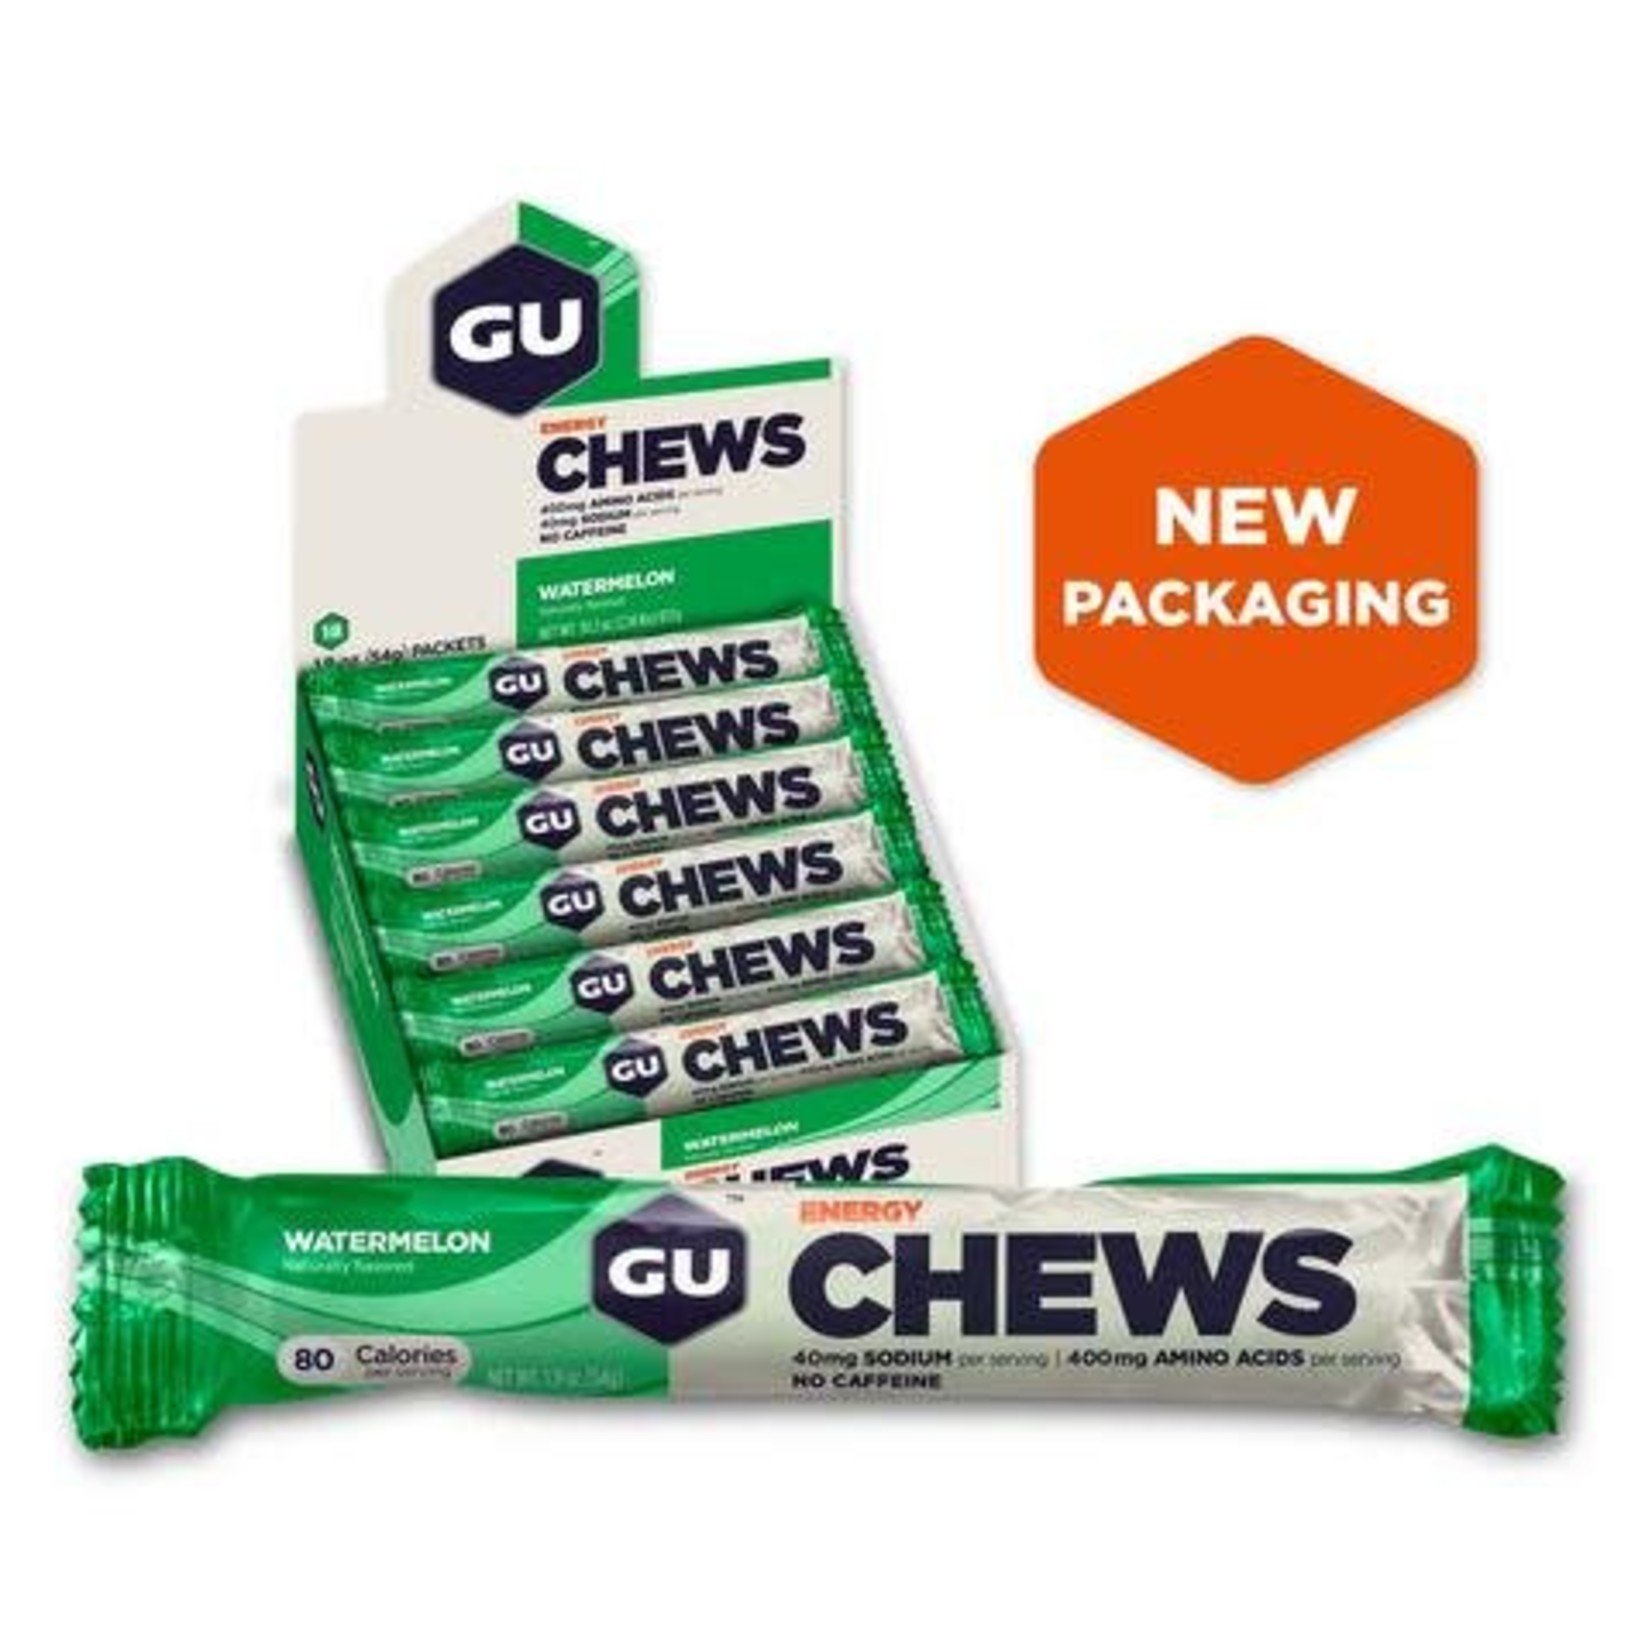 GU Double Serve Energy Chews - Watermelon